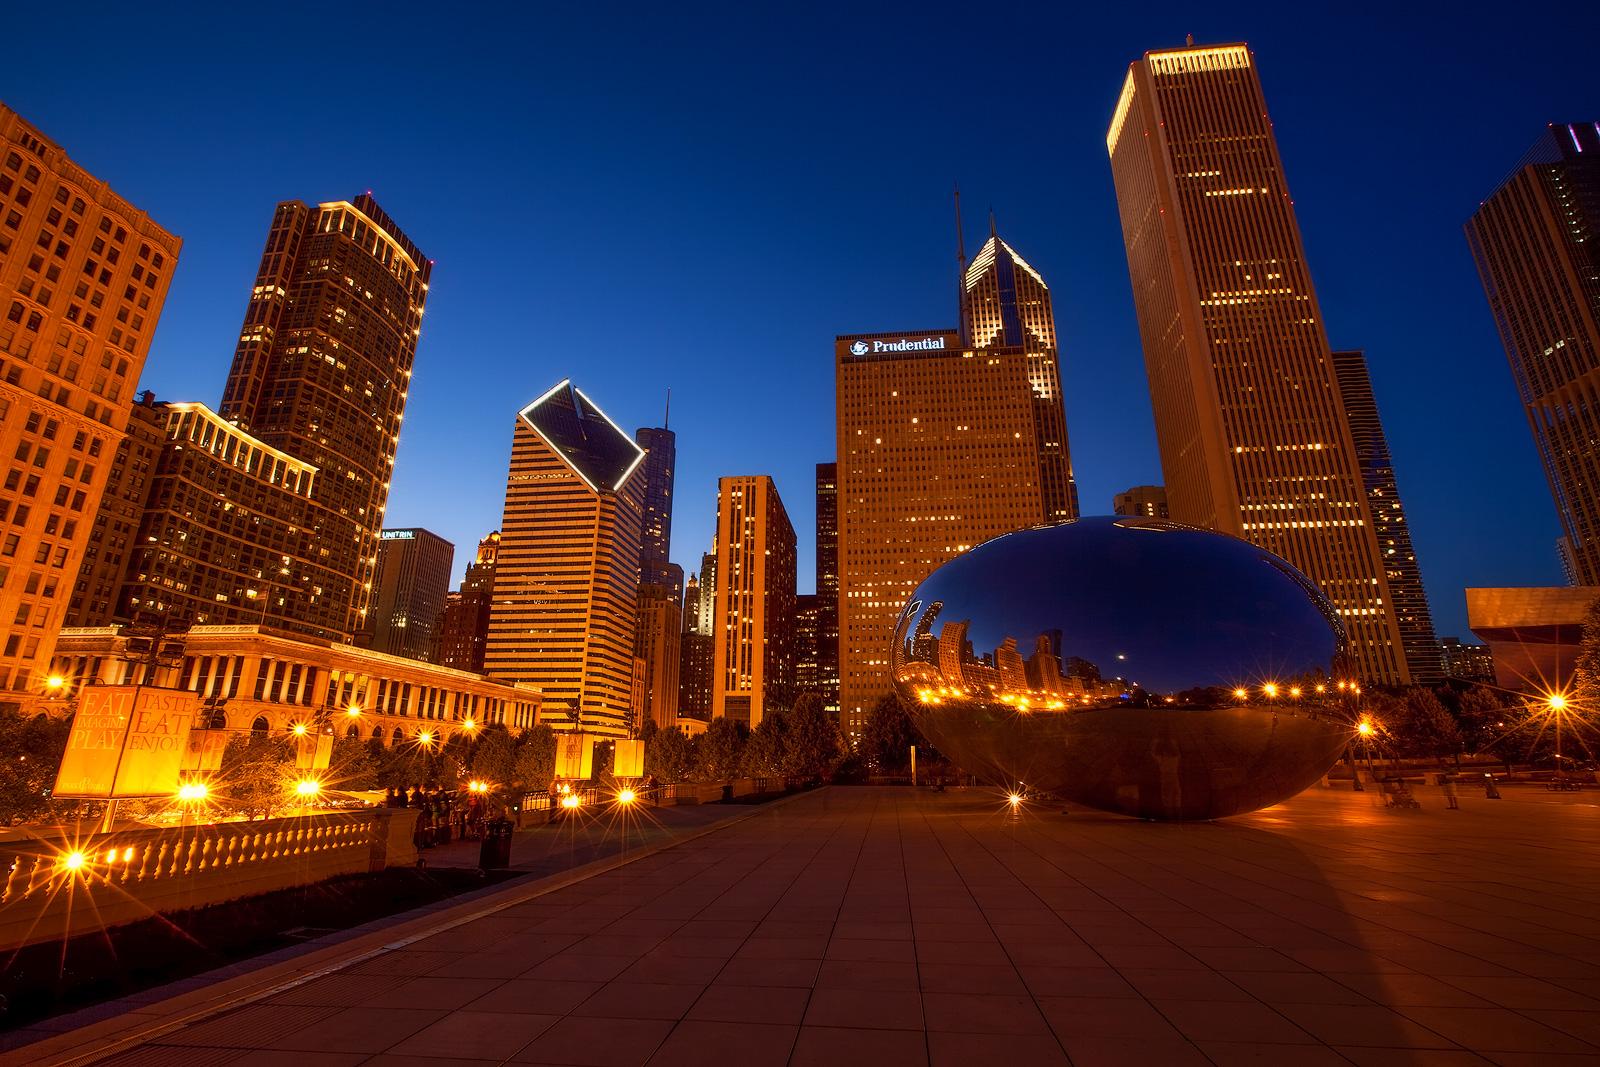 america,bean,chicago,city scape,cityscape,horizontal,il,illinois,midwest,millennium park,north america,the bean,united states,us,usa, photo